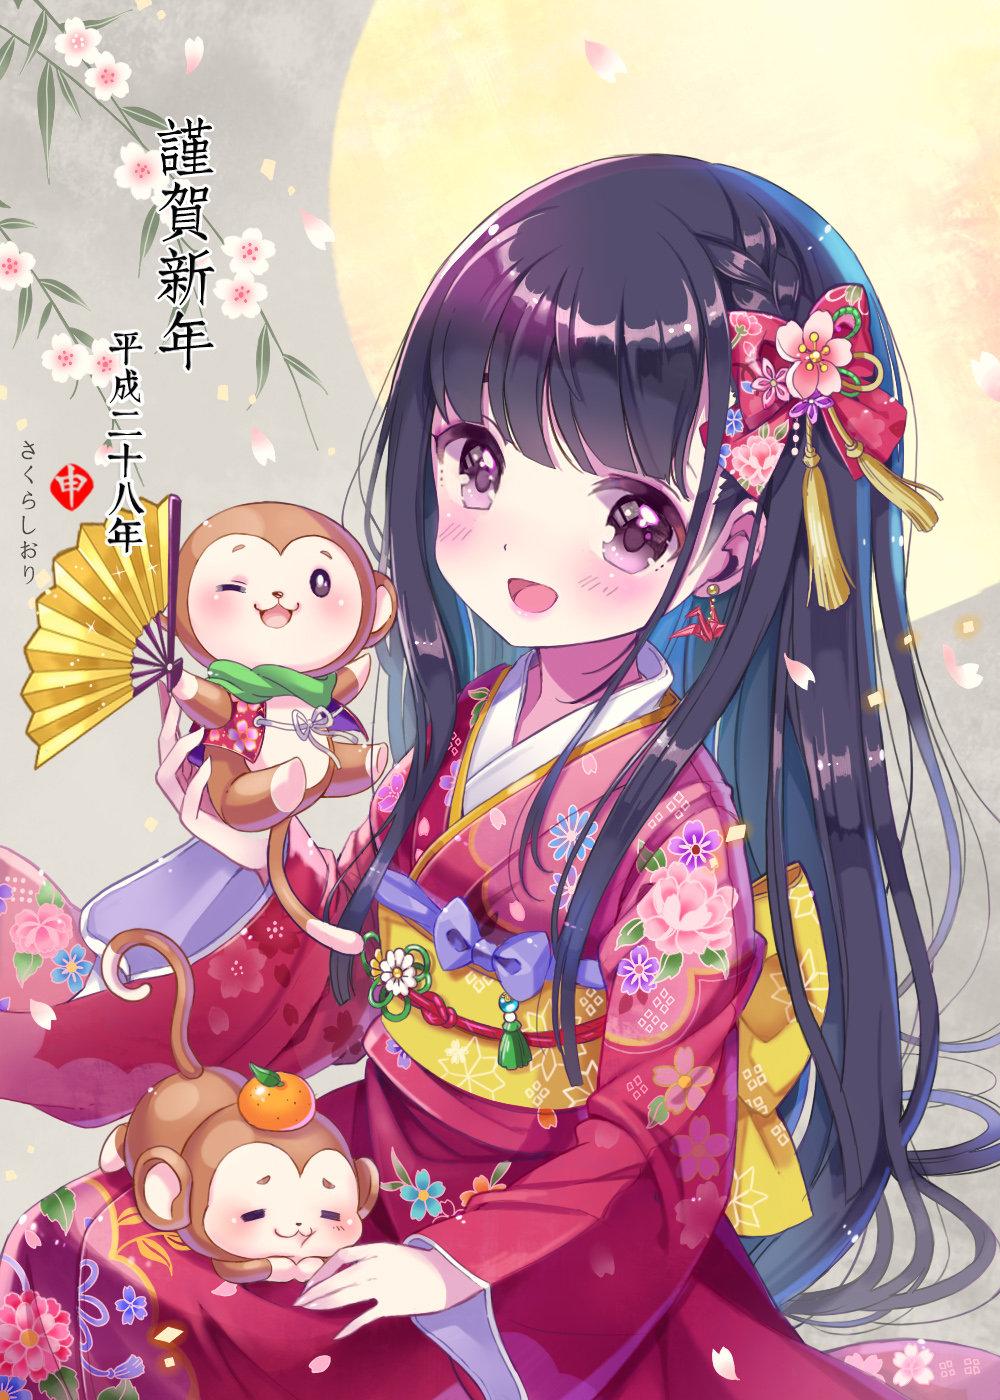 [P站画师推荐] 日本画师 さくらしおり的插画作品,真的是MIKU控吗,你爱的初音来了。 P站画师-第10张